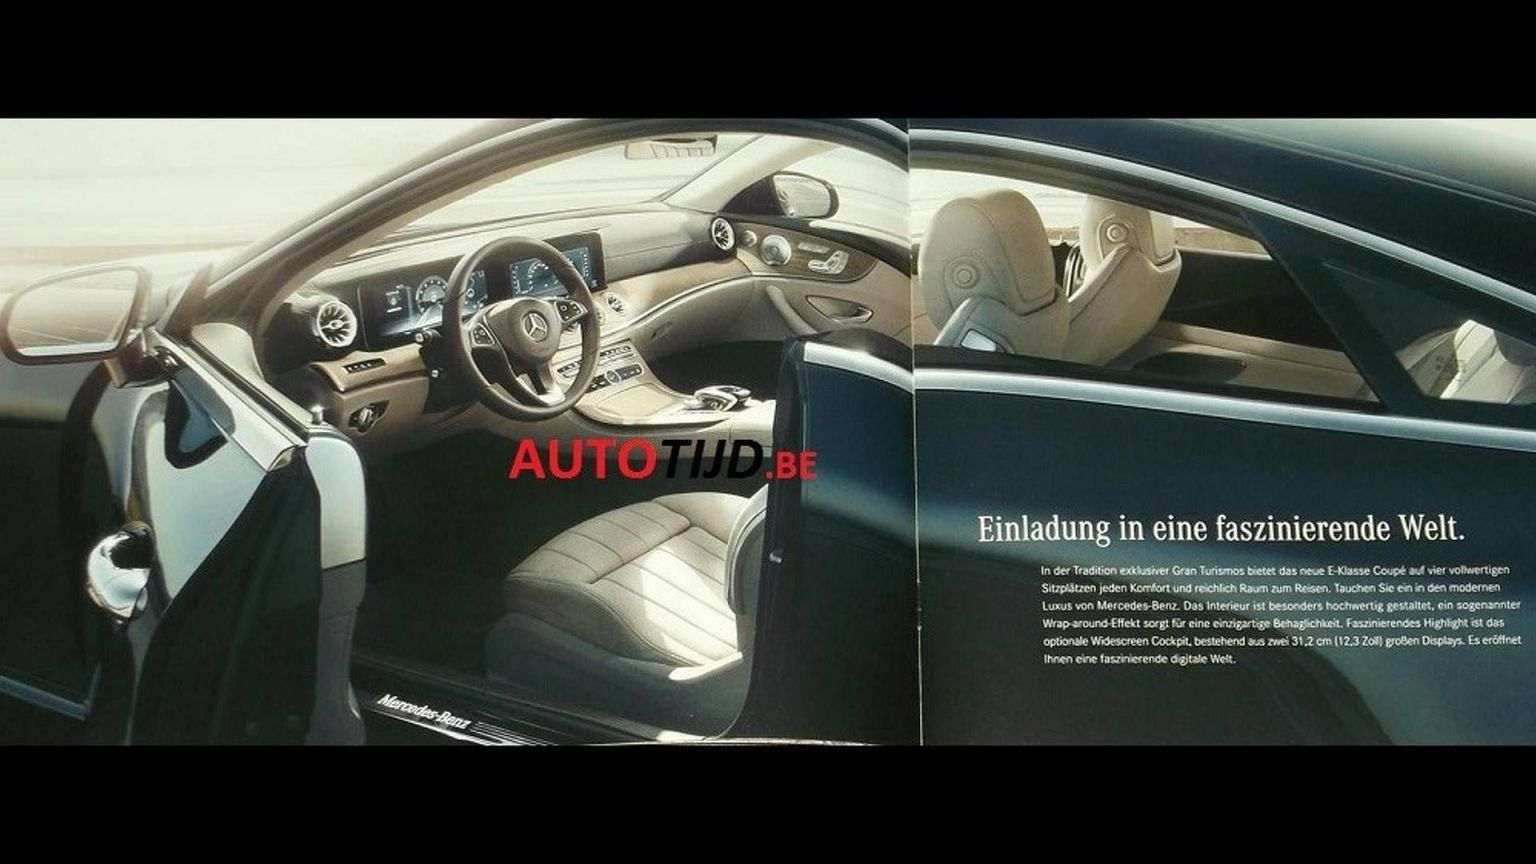 2017-mercedes-e-class-coupe-6-768x432@2x